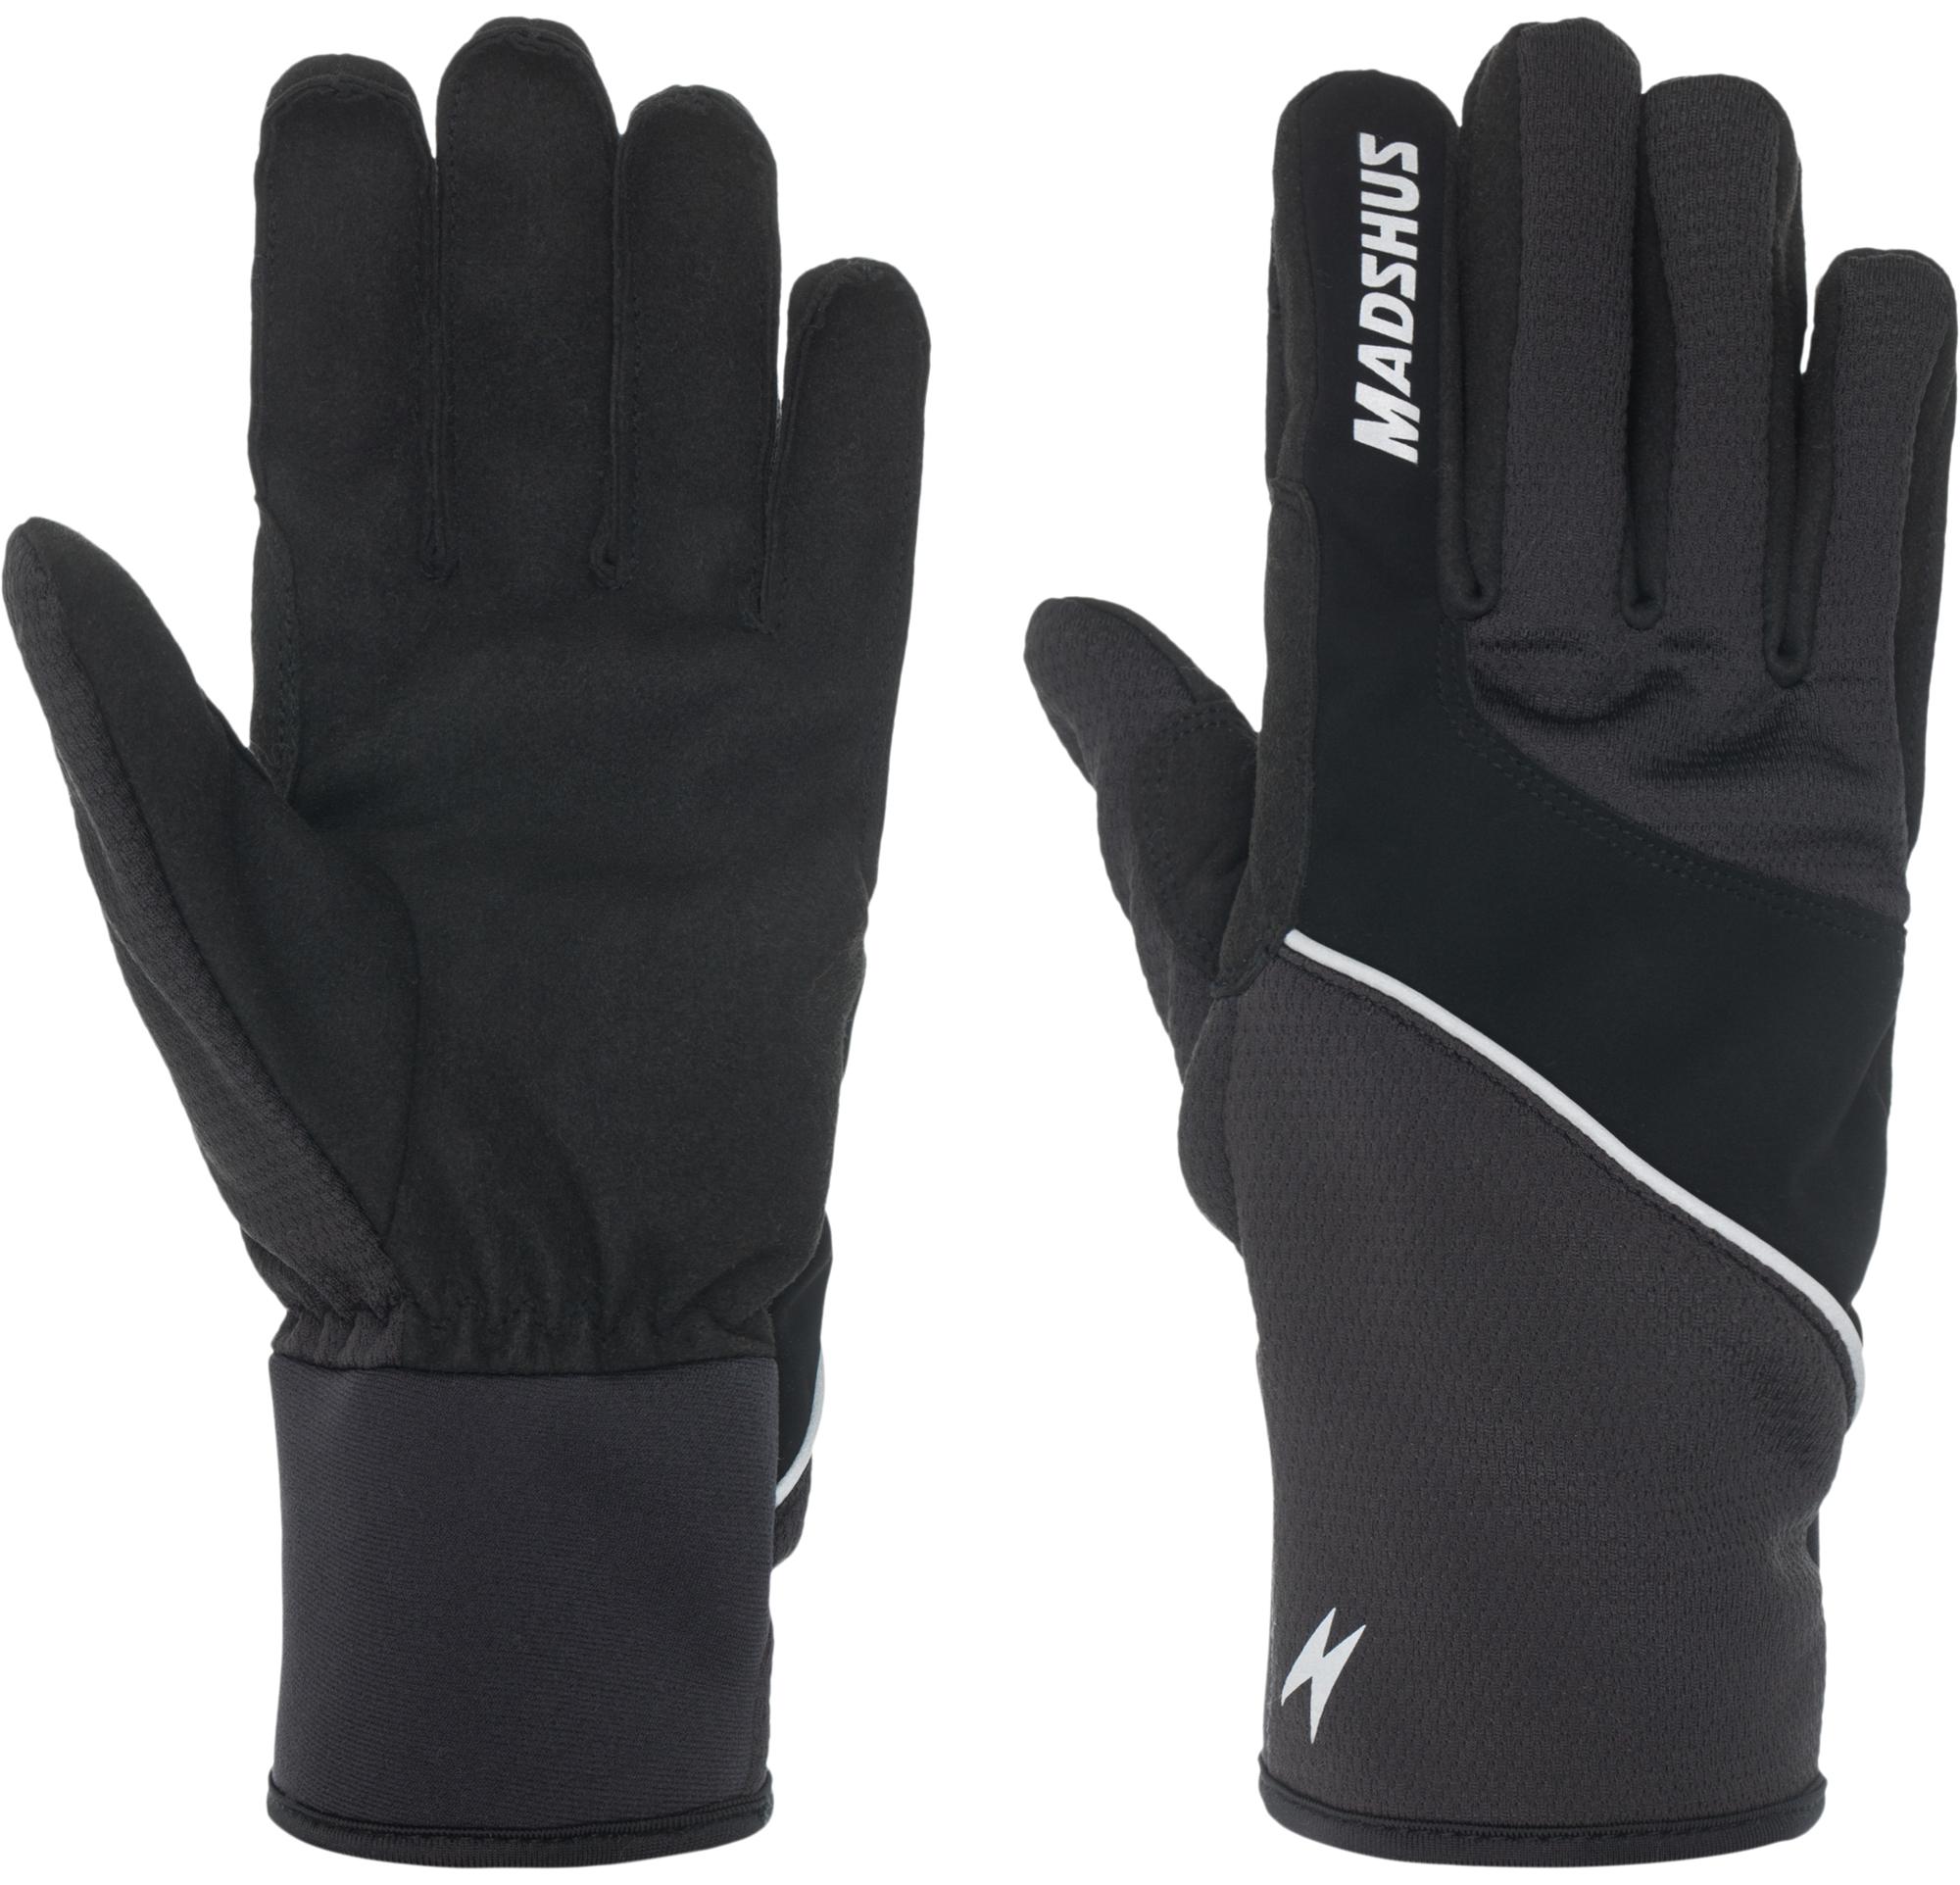 Madshus Перчатки Madshus, размер 9 перчатки jetasafety jle021 9 l12